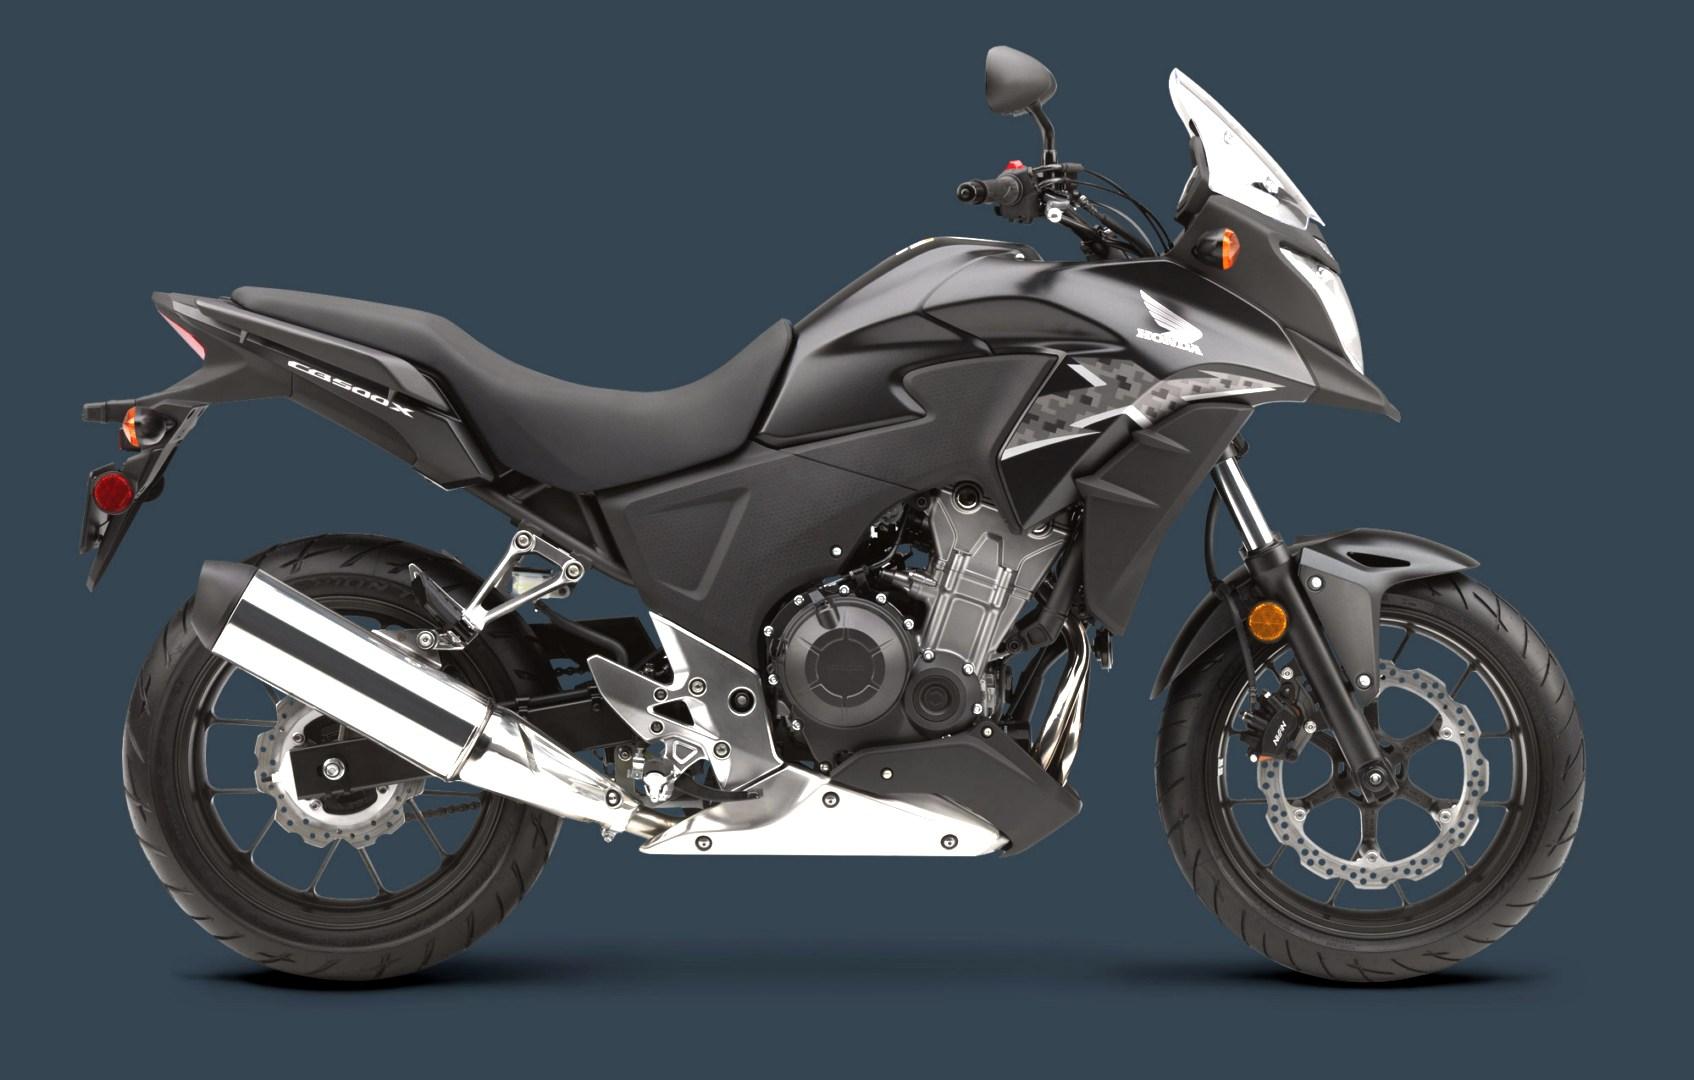 2013 honda cb500x the new middleweight versatile bike autoevolution. Black Bedroom Furniture Sets. Home Design Ideas